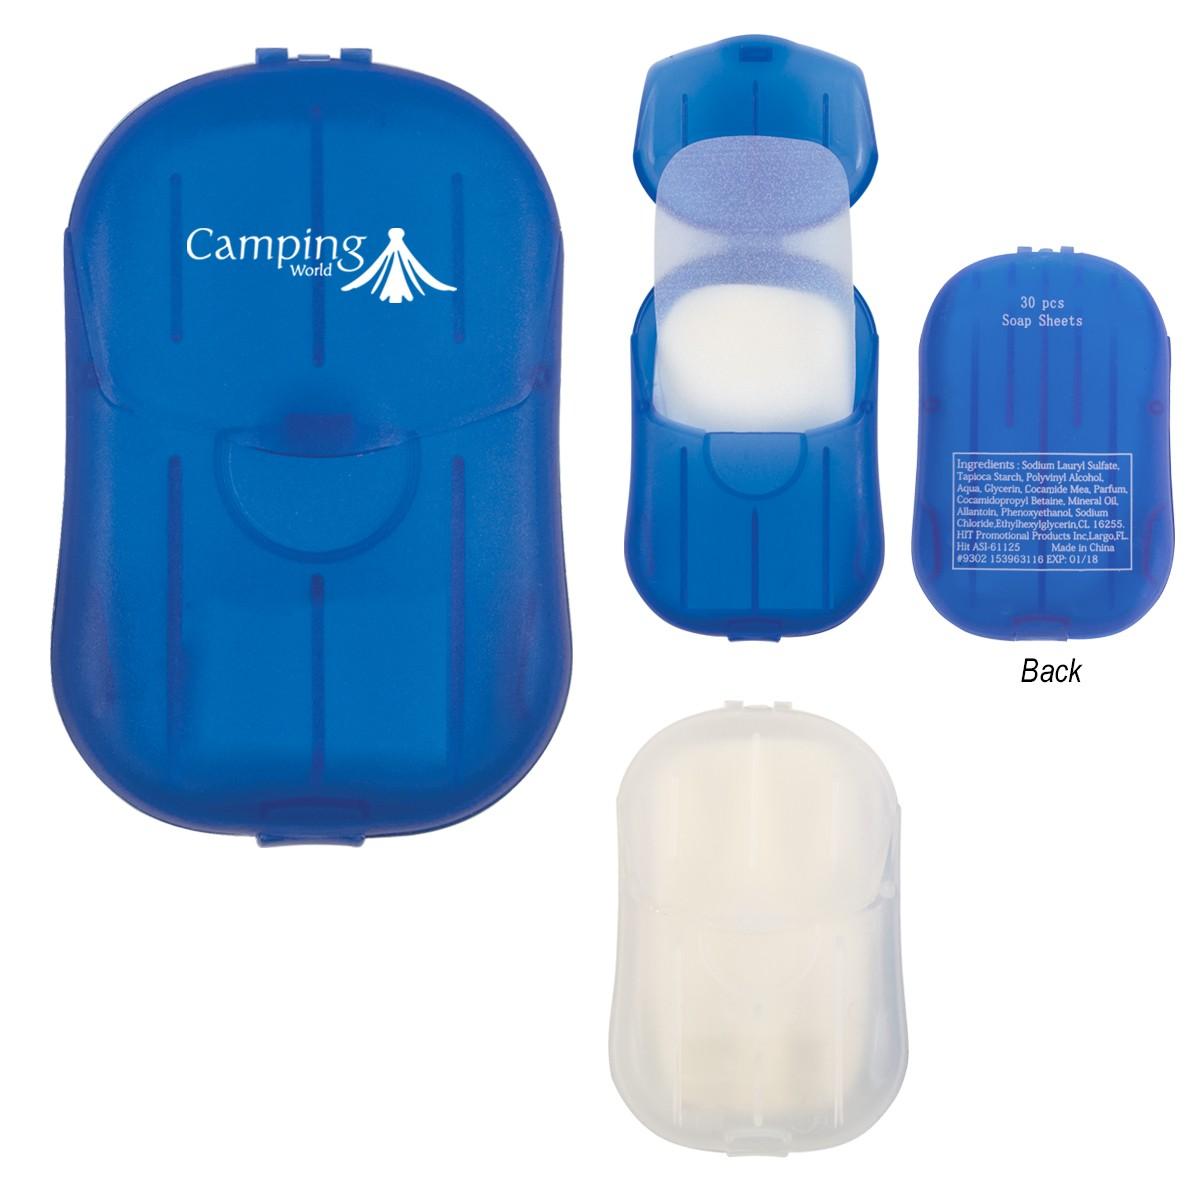 custom-branded-soap-dispenser-soap-sheets-va-dc-ny